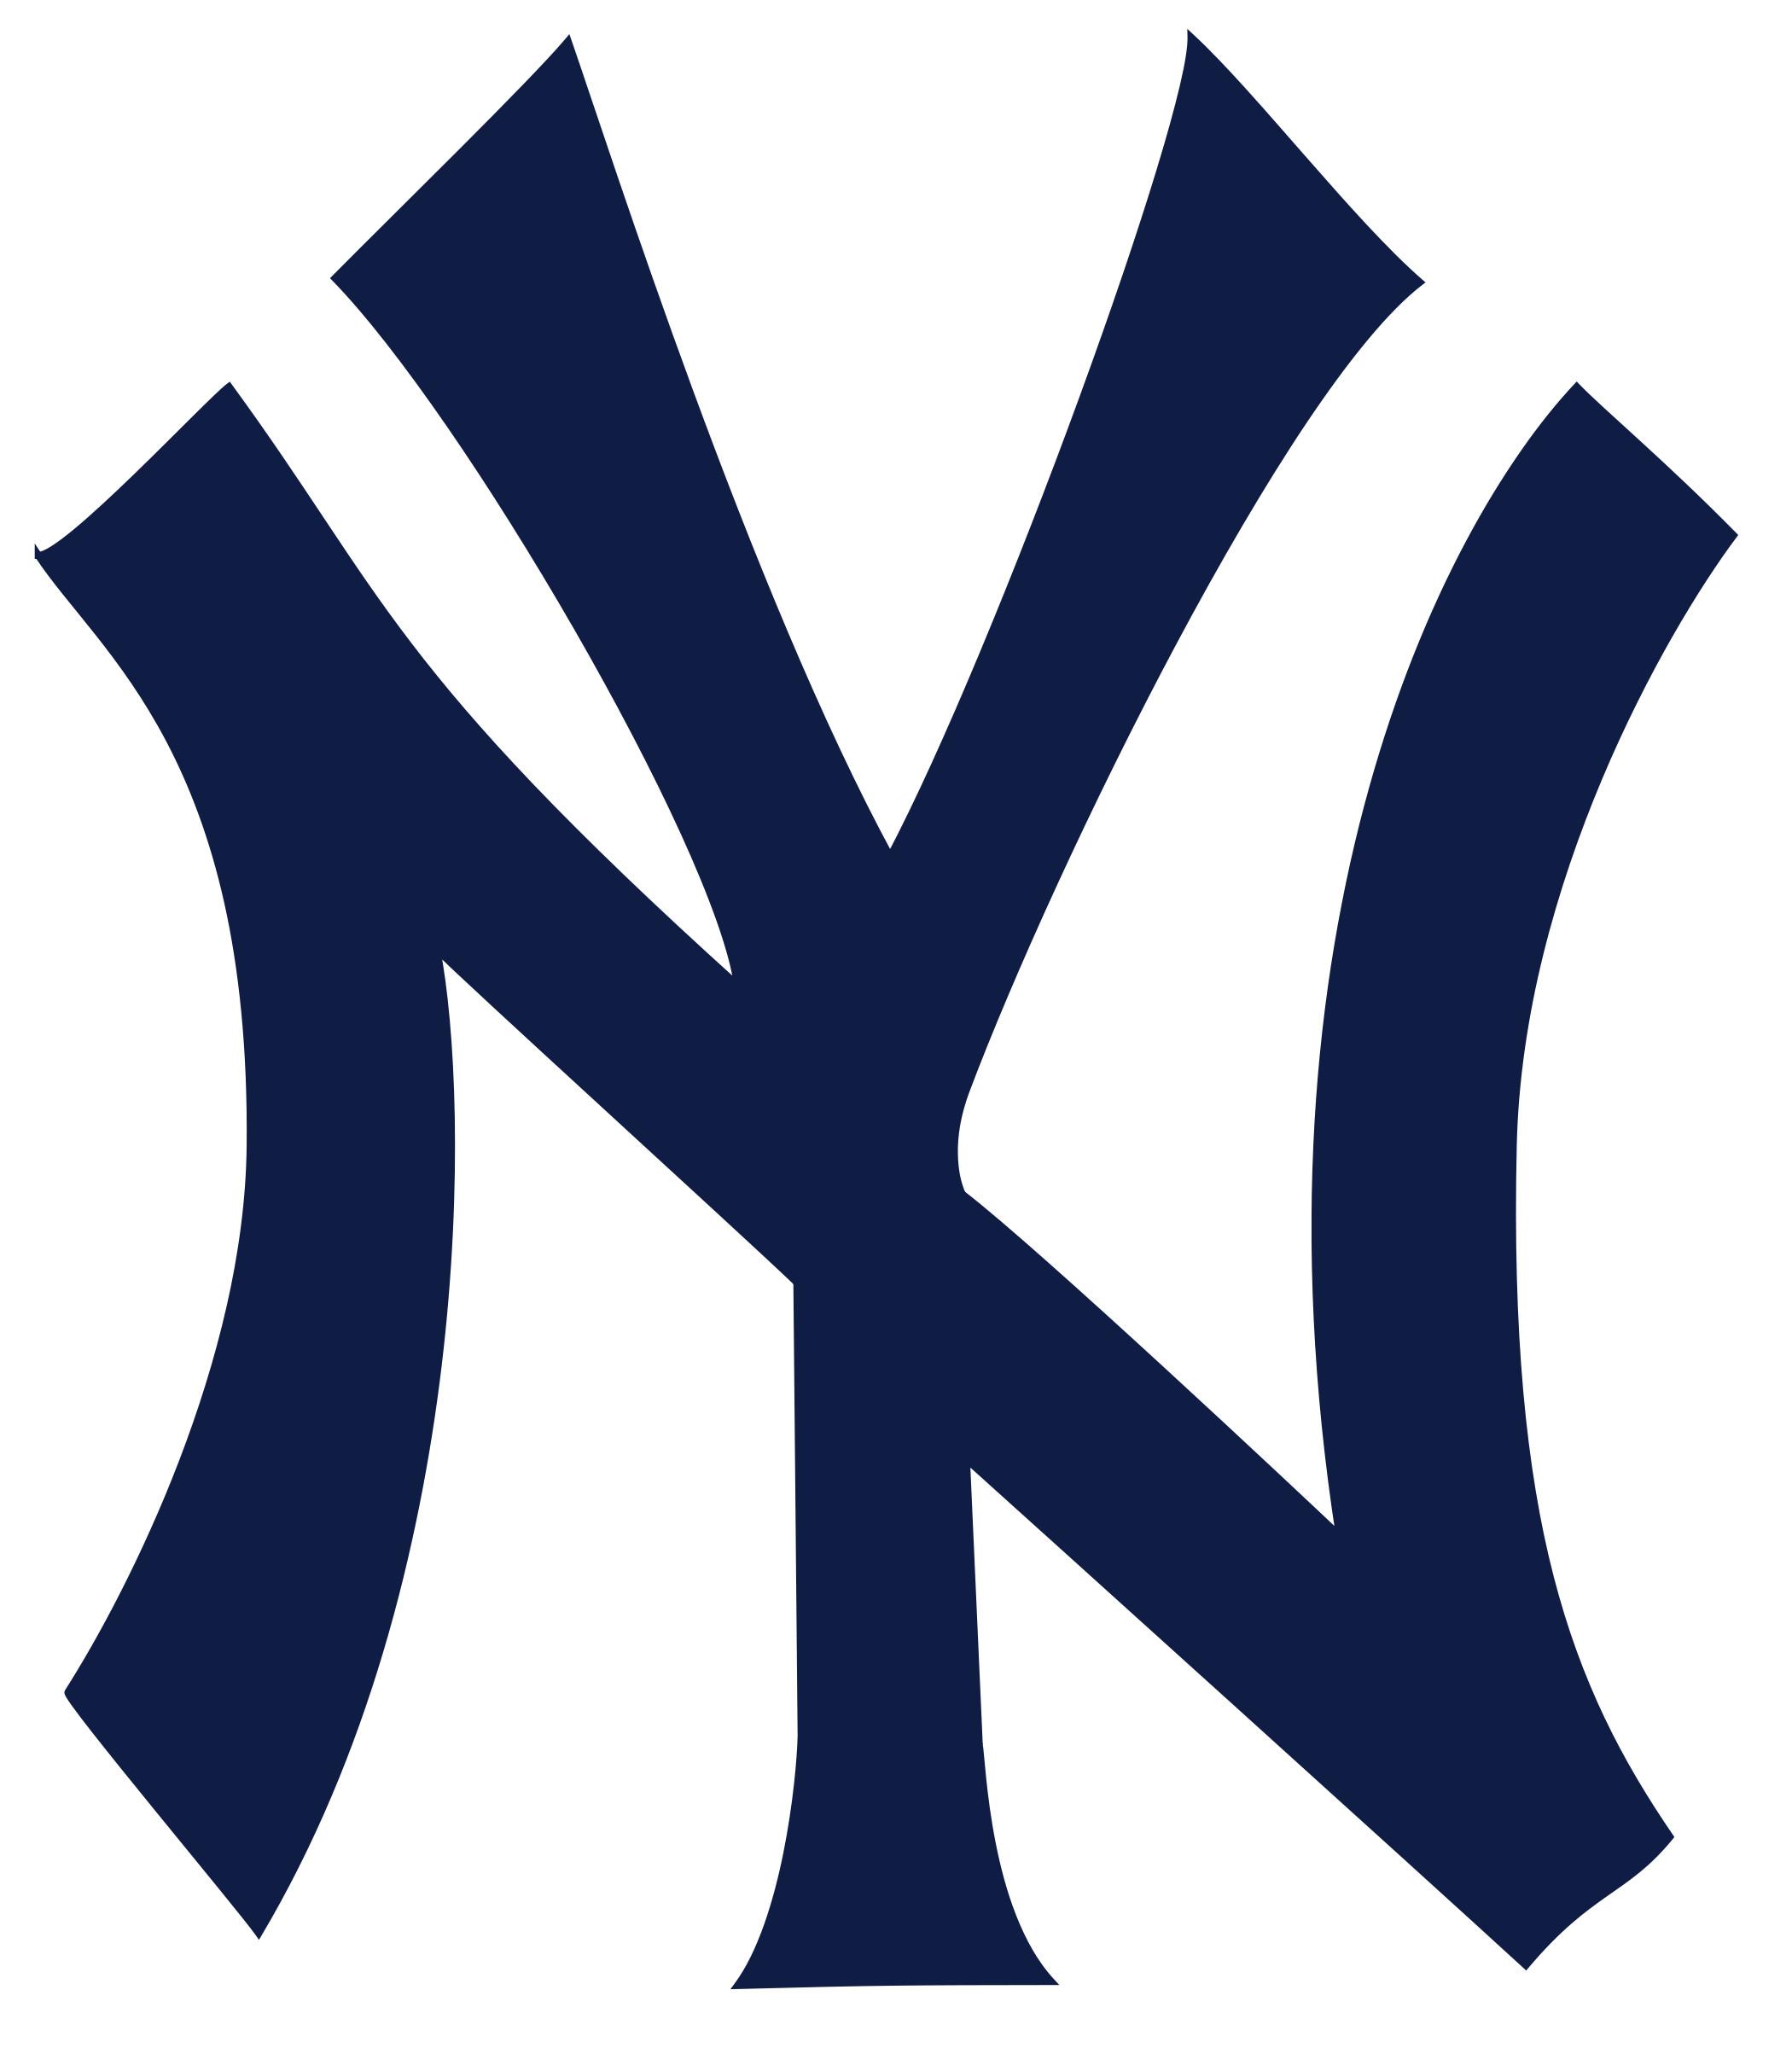 ny yankees logo wallpaper 60 images rh getwallpapers com Yankees iPhone Wallpaper Yankee Stadium Wallpaper